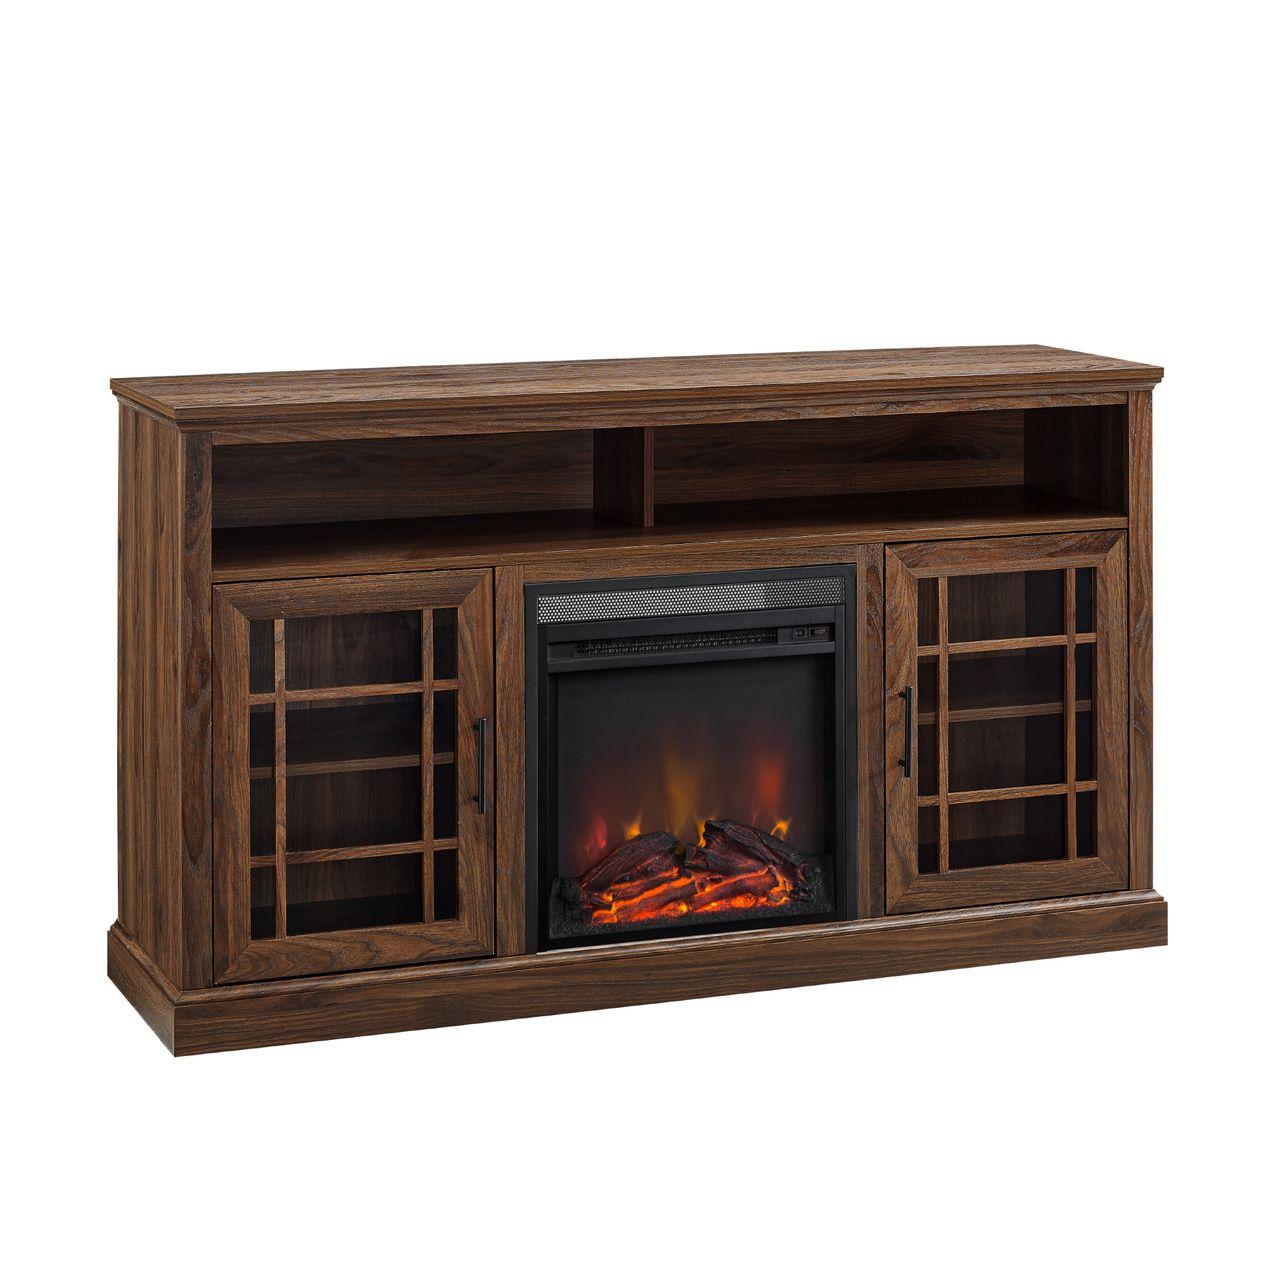 "Walker Edison Hazel 58"" Highboy Fireplace TV Stand - Dark Walnut"